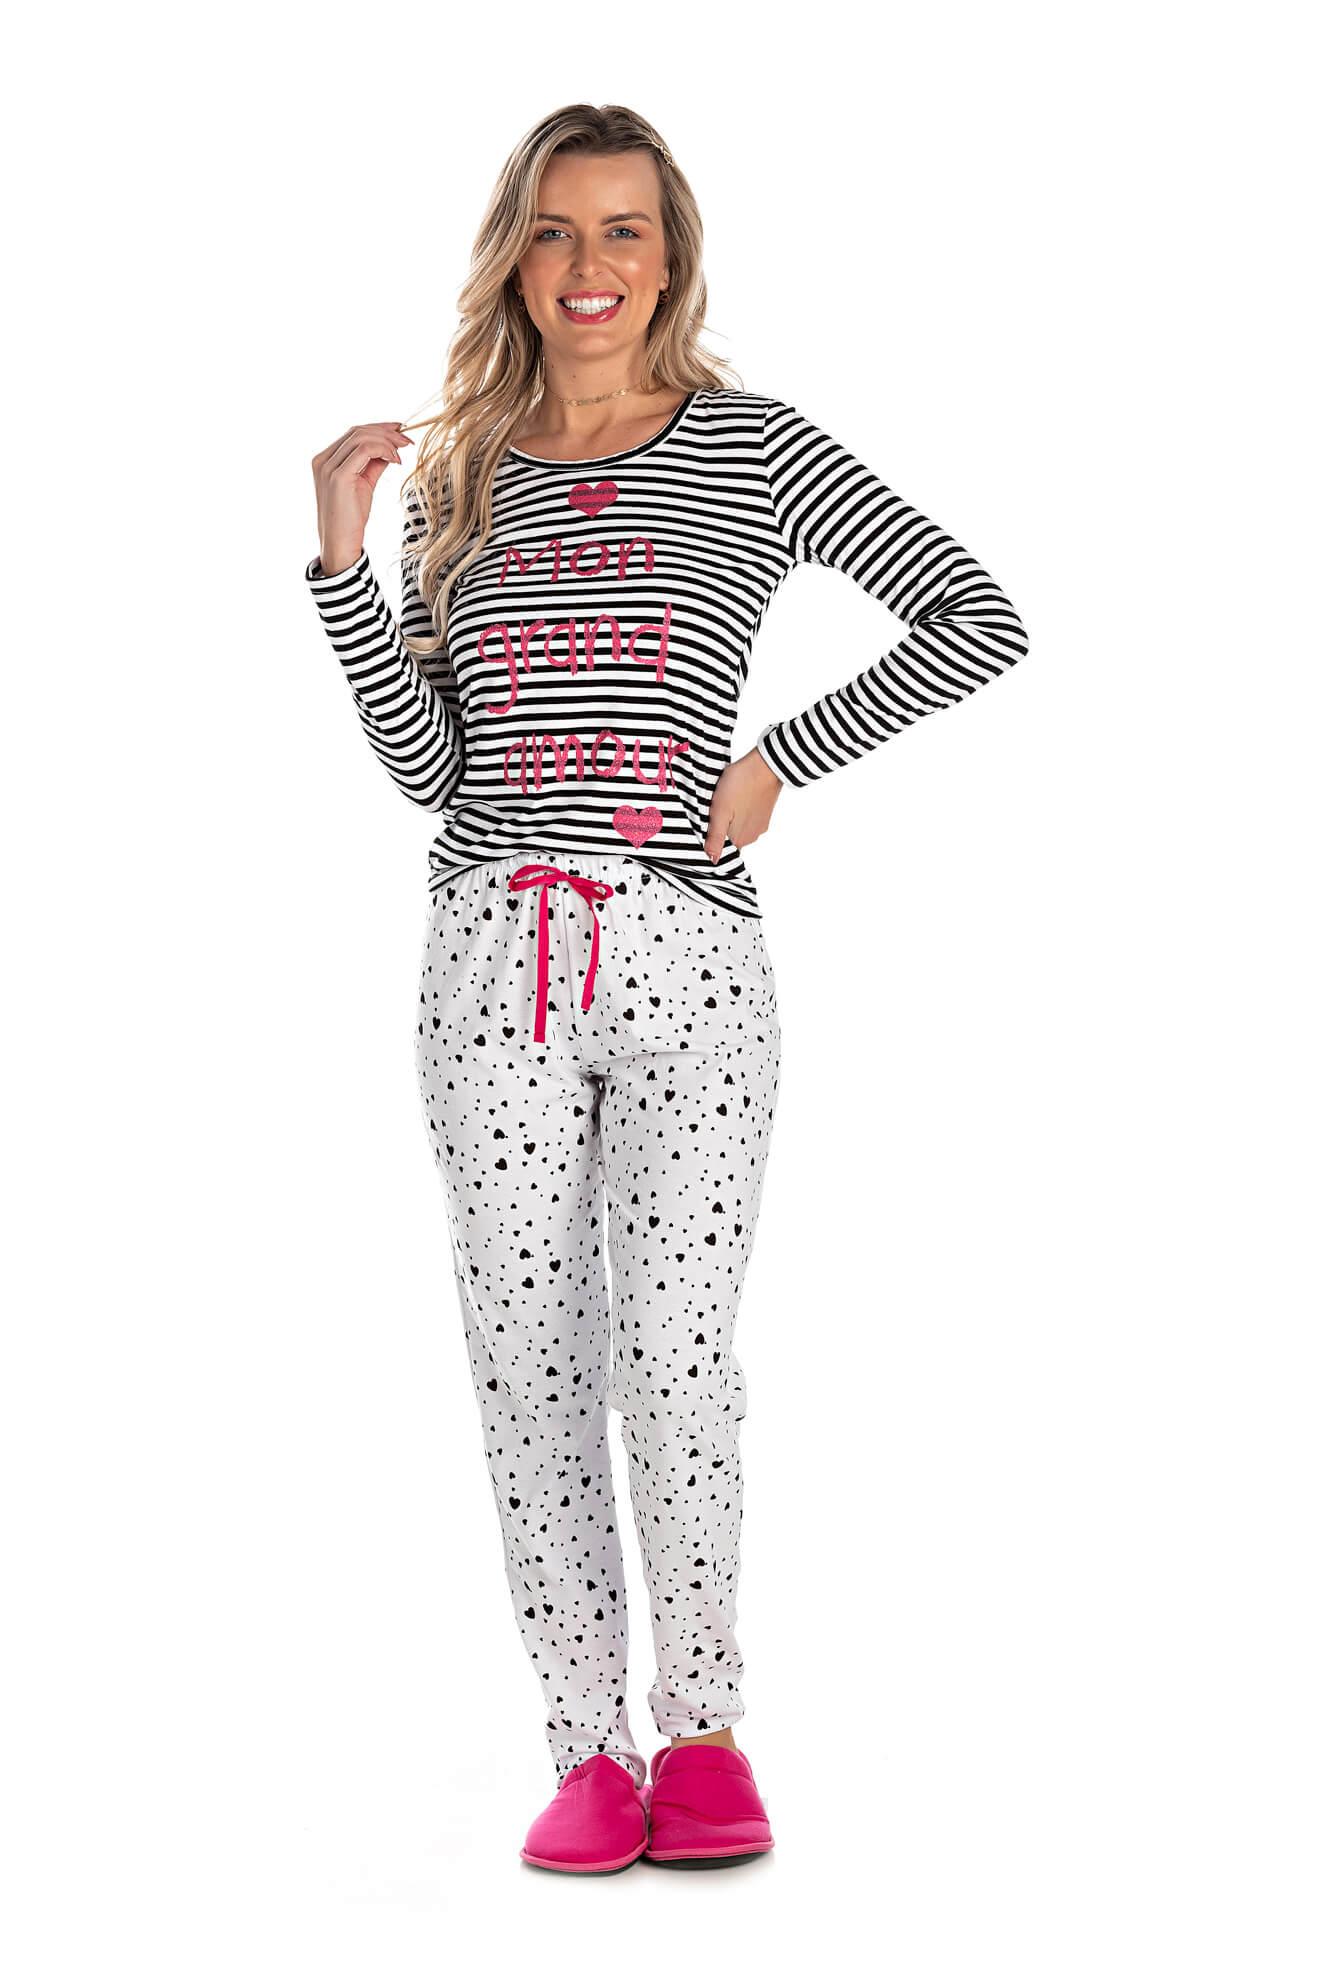 008/A - Pijama Adulto Feminino Mon Petit Coeur